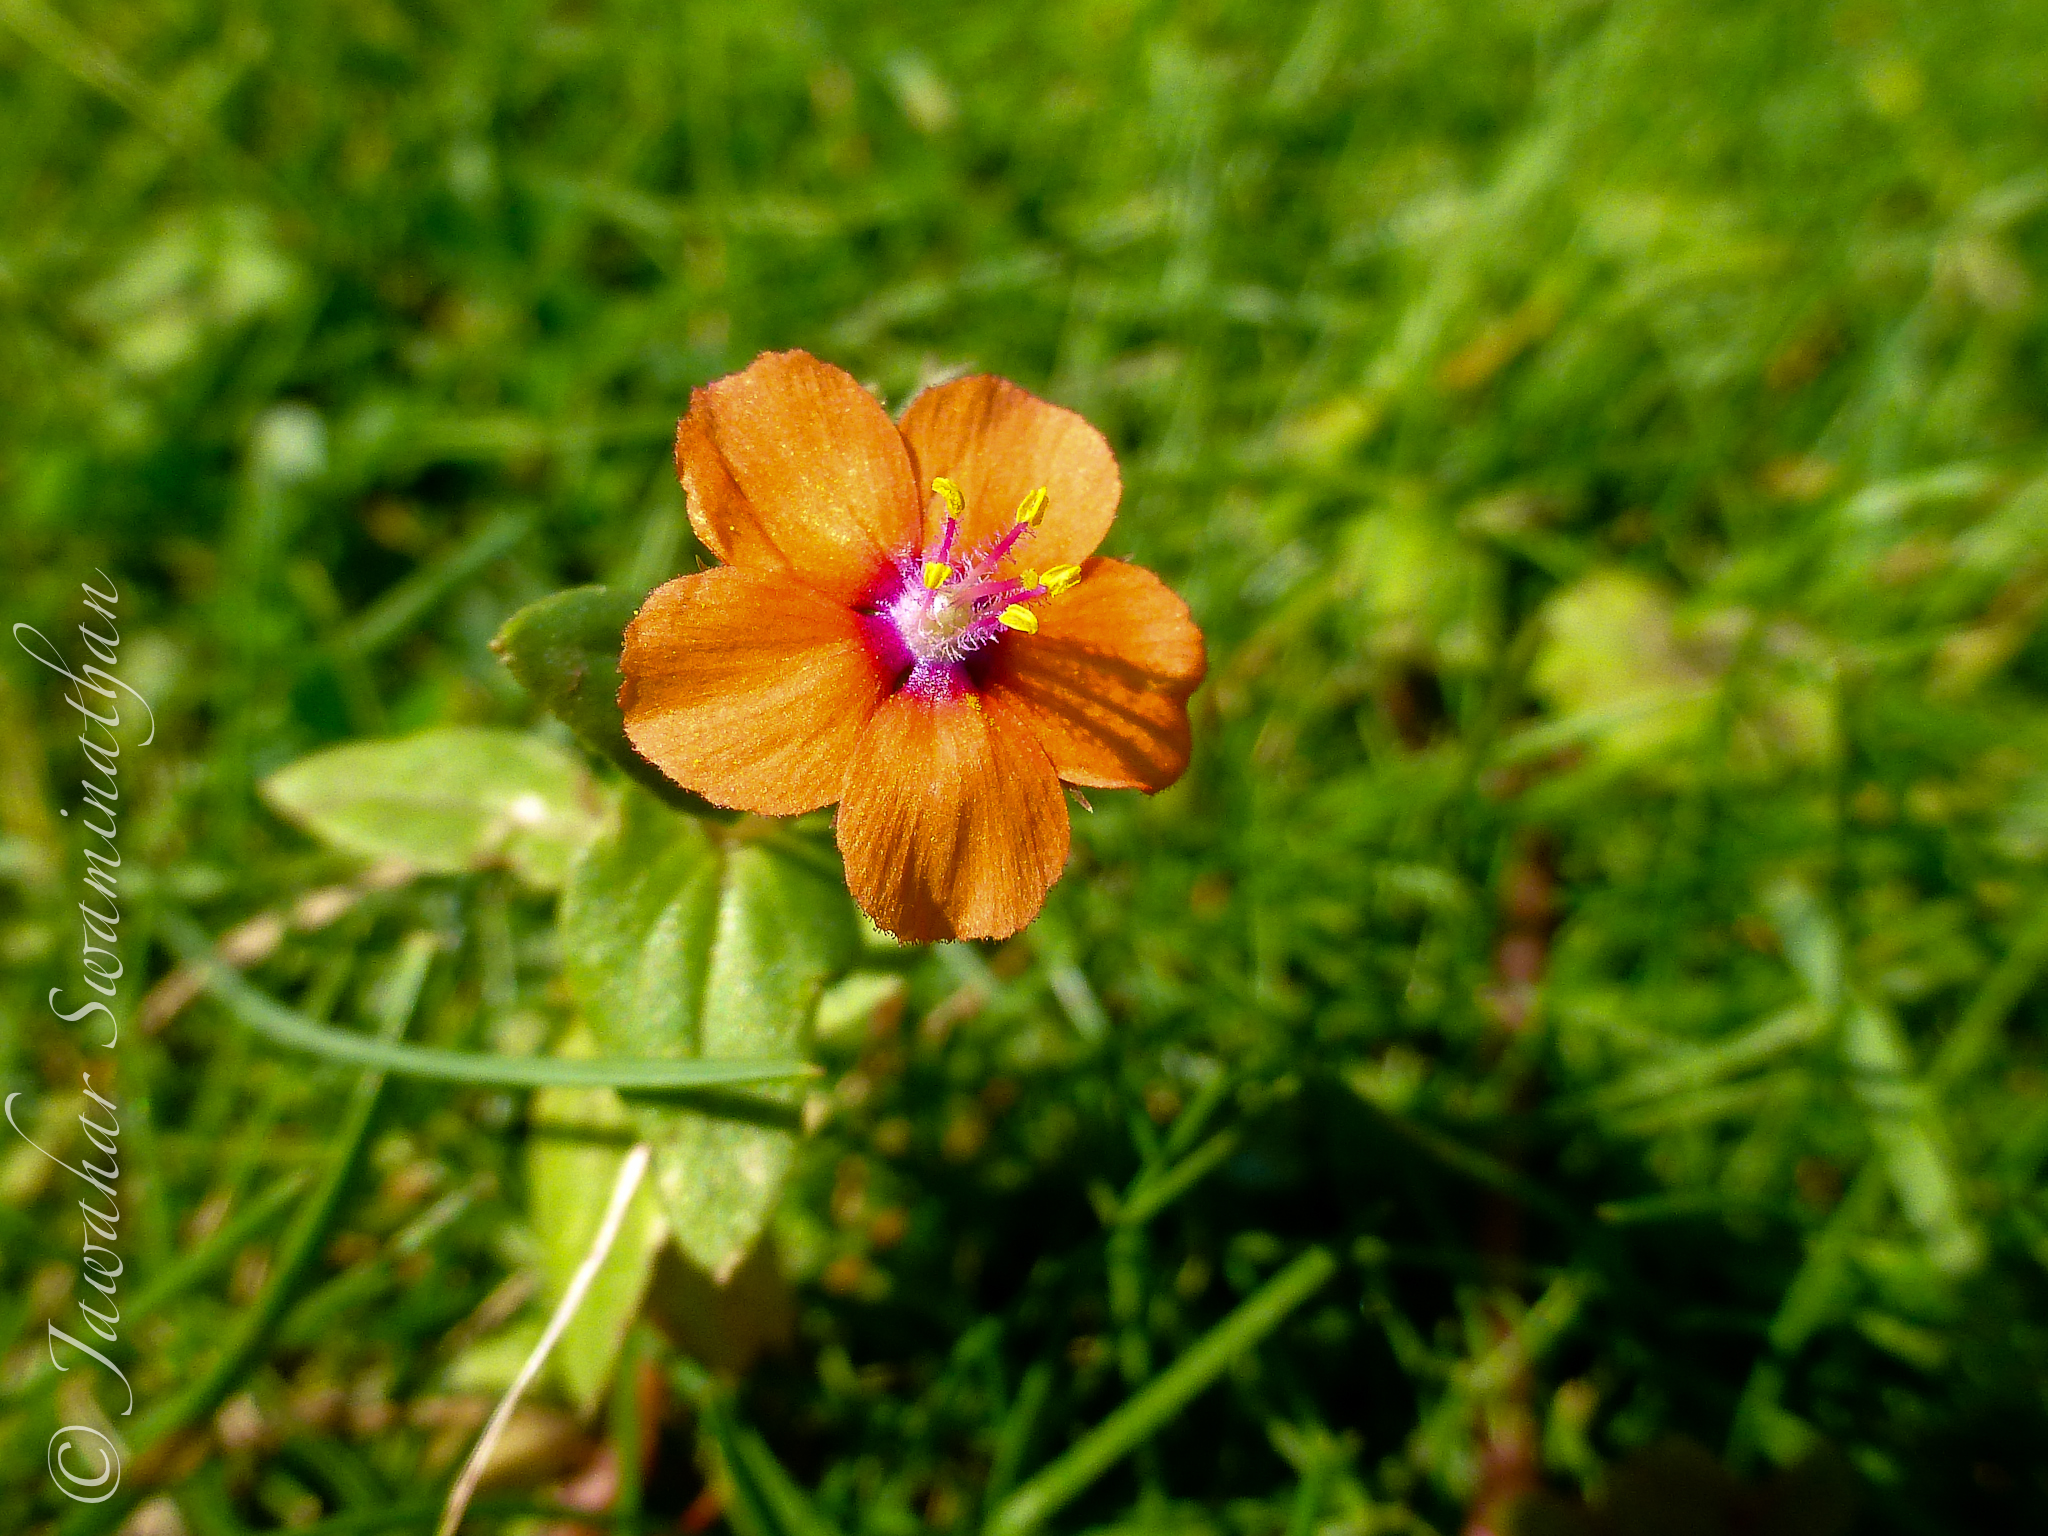 British Wildflowers – Scarlet Pimpernel | Juridicious